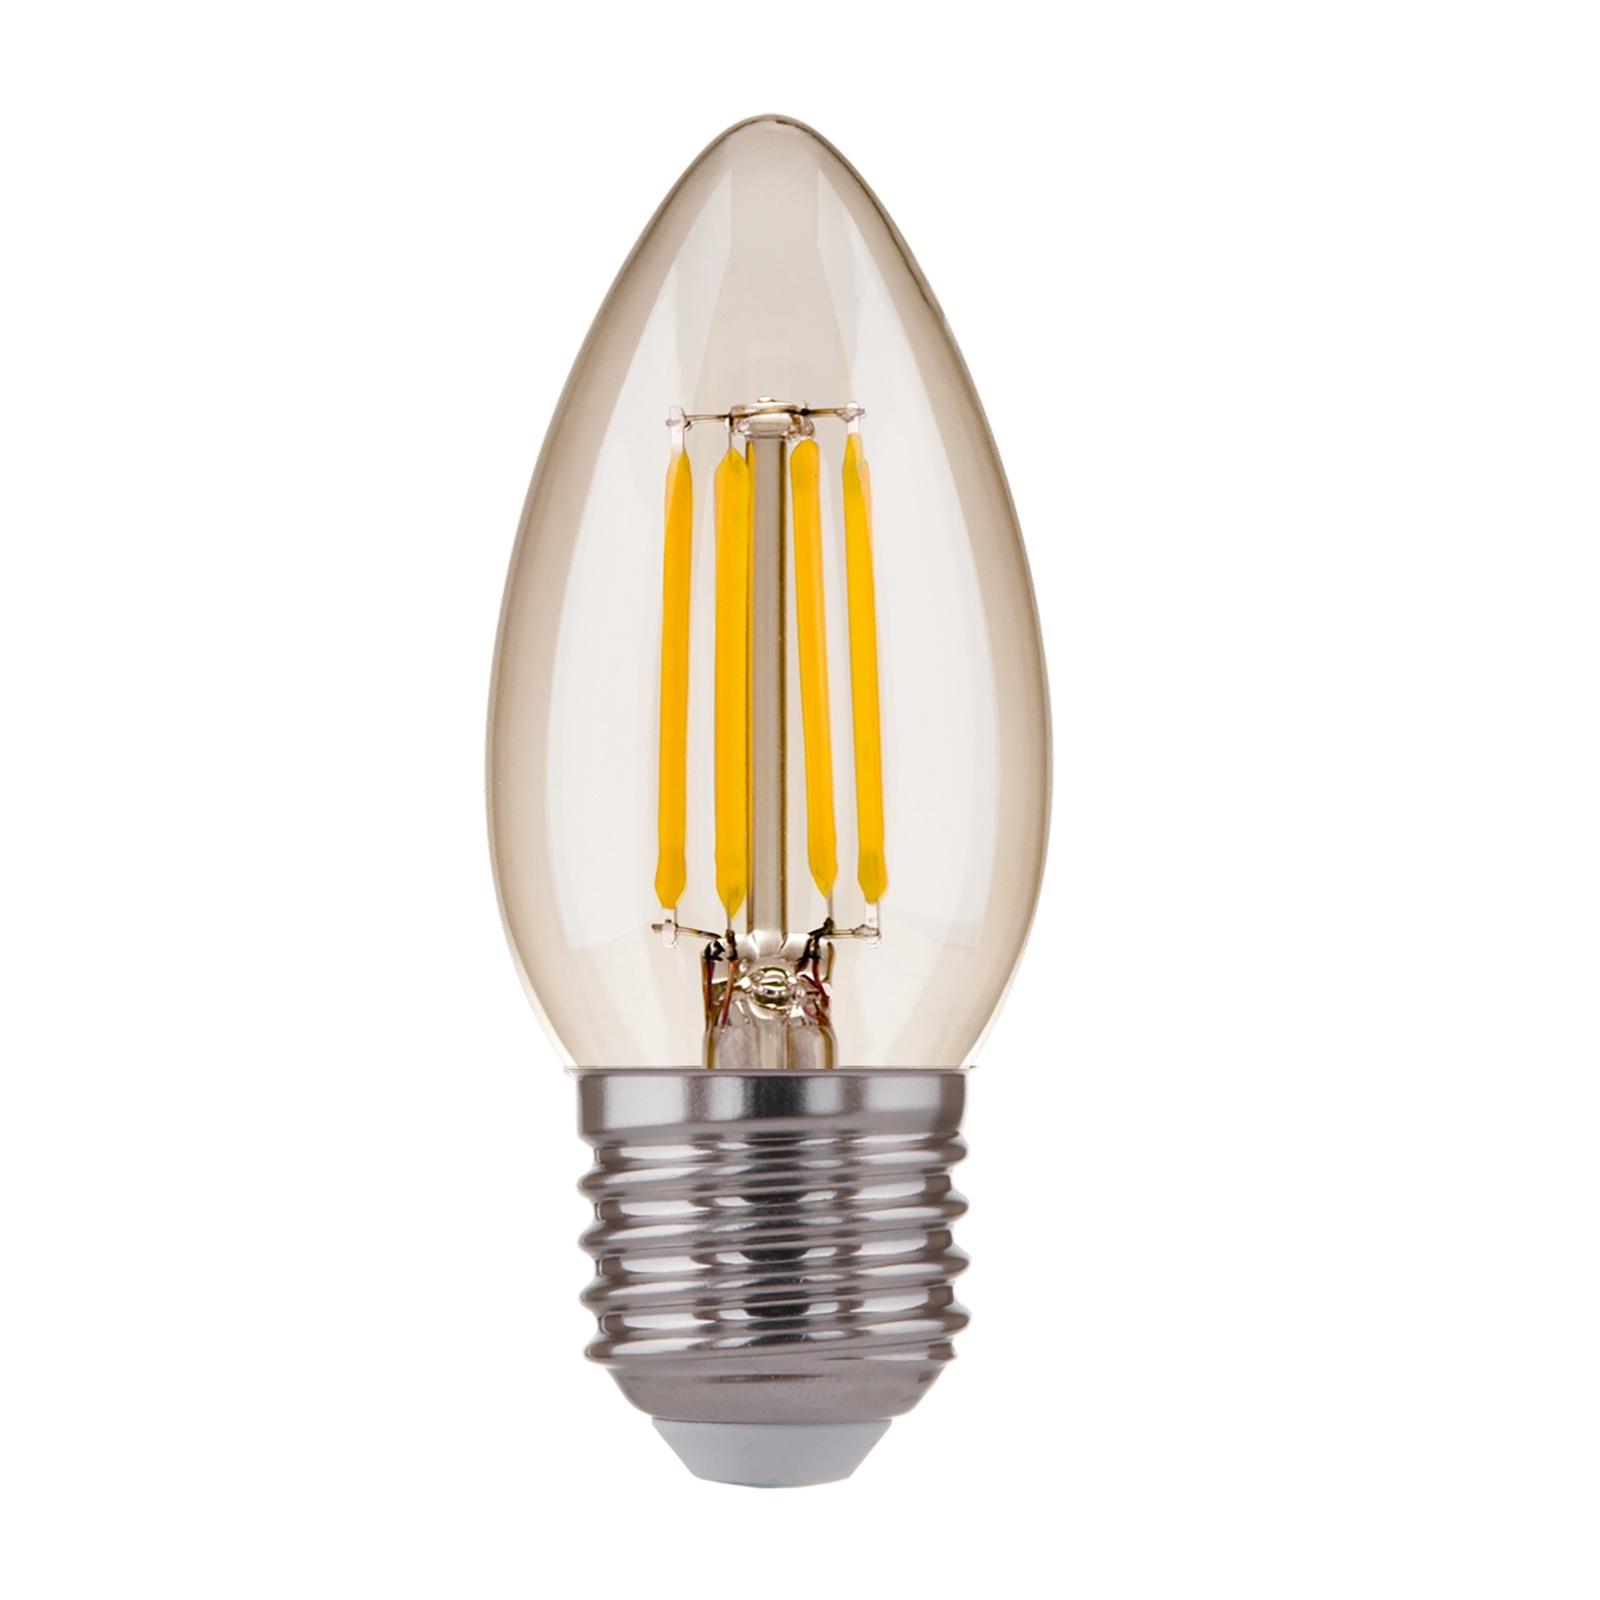 Лампочка Elektrostandard светодиодная Свеча CD F 7W 3300K E27, Теплый свет 7 Вт, Светодиодная светодиодная лампа kosmos теплый свет цоколь e27 7w 220v lksm led7wr63e2730